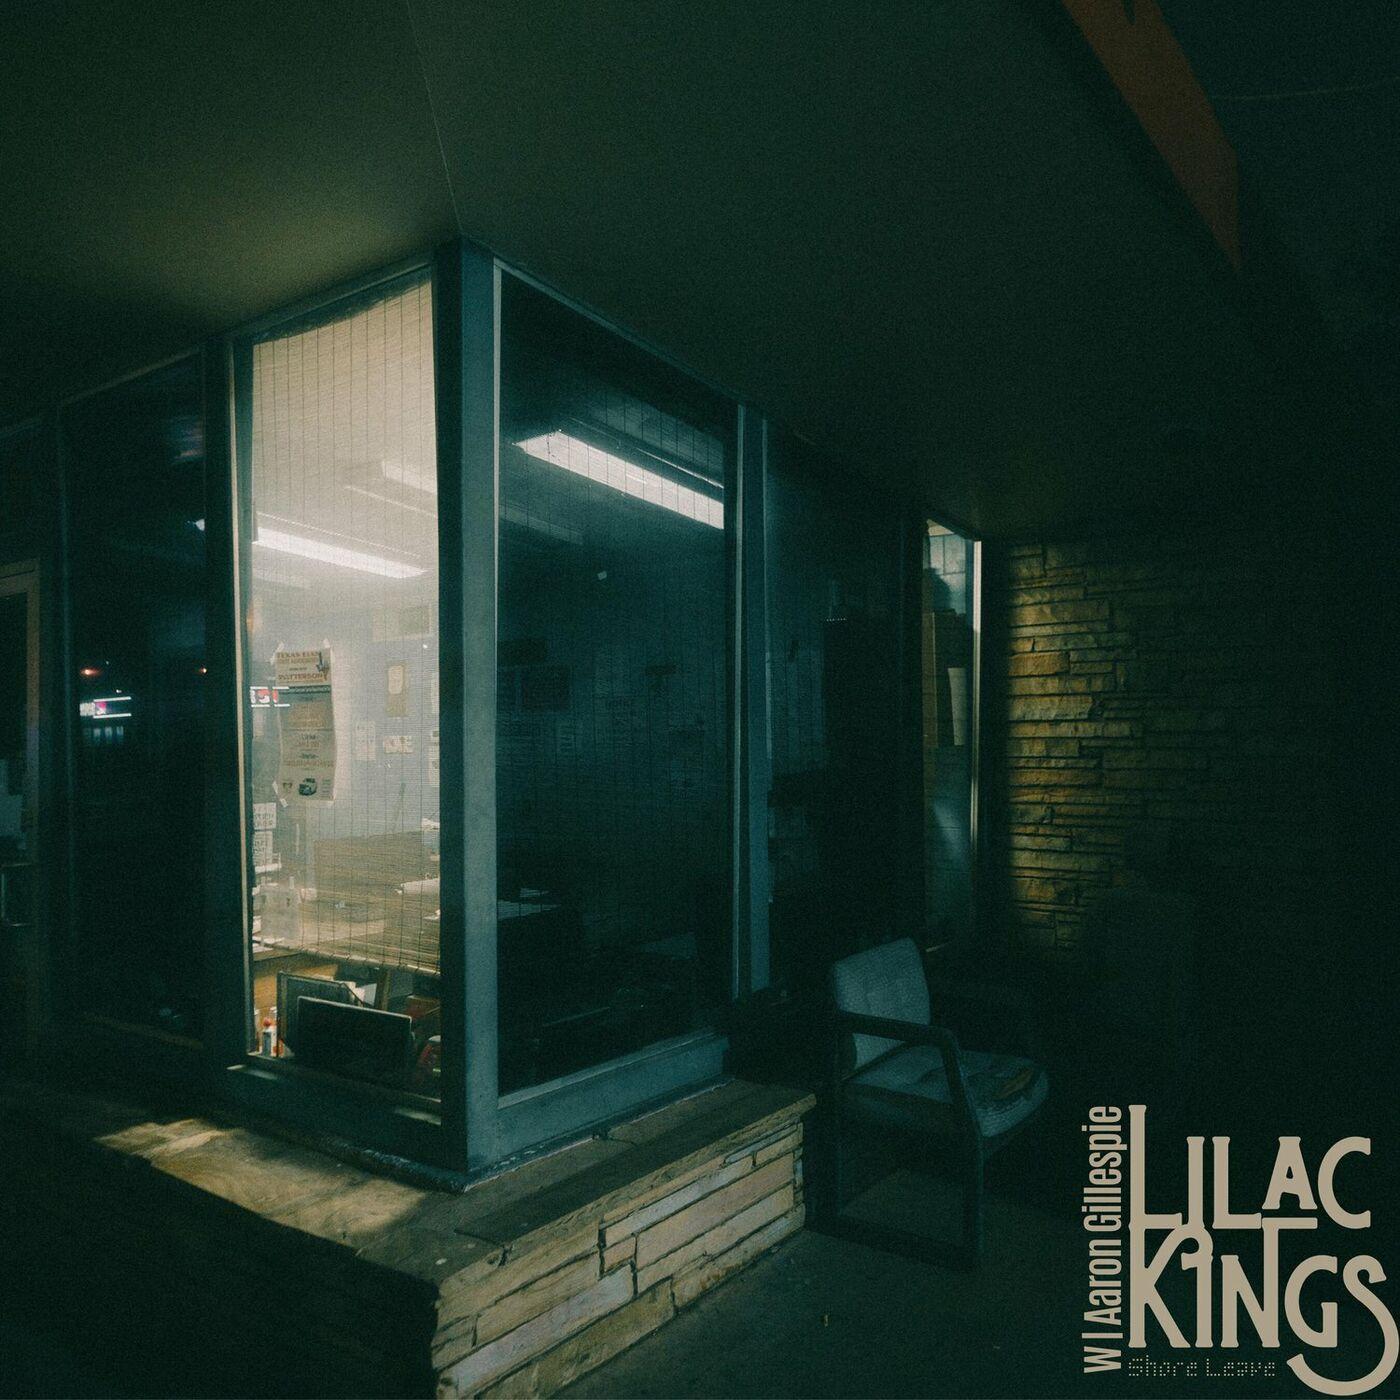 Lilac Kings - Shore Leave [single] (2020)